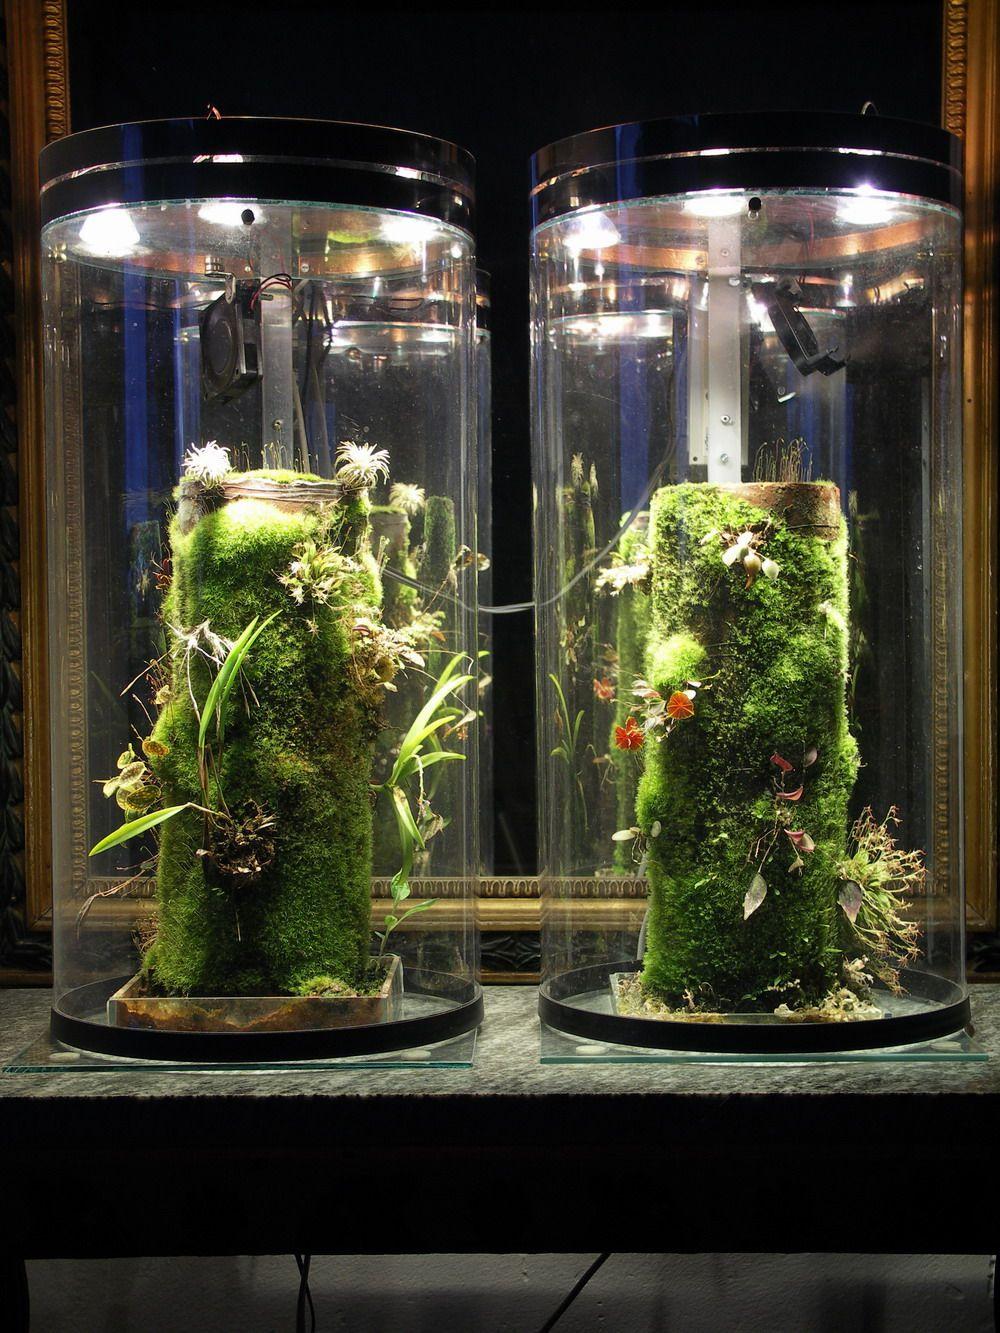 Click the image to open in full size 植物 pinterest vivarium